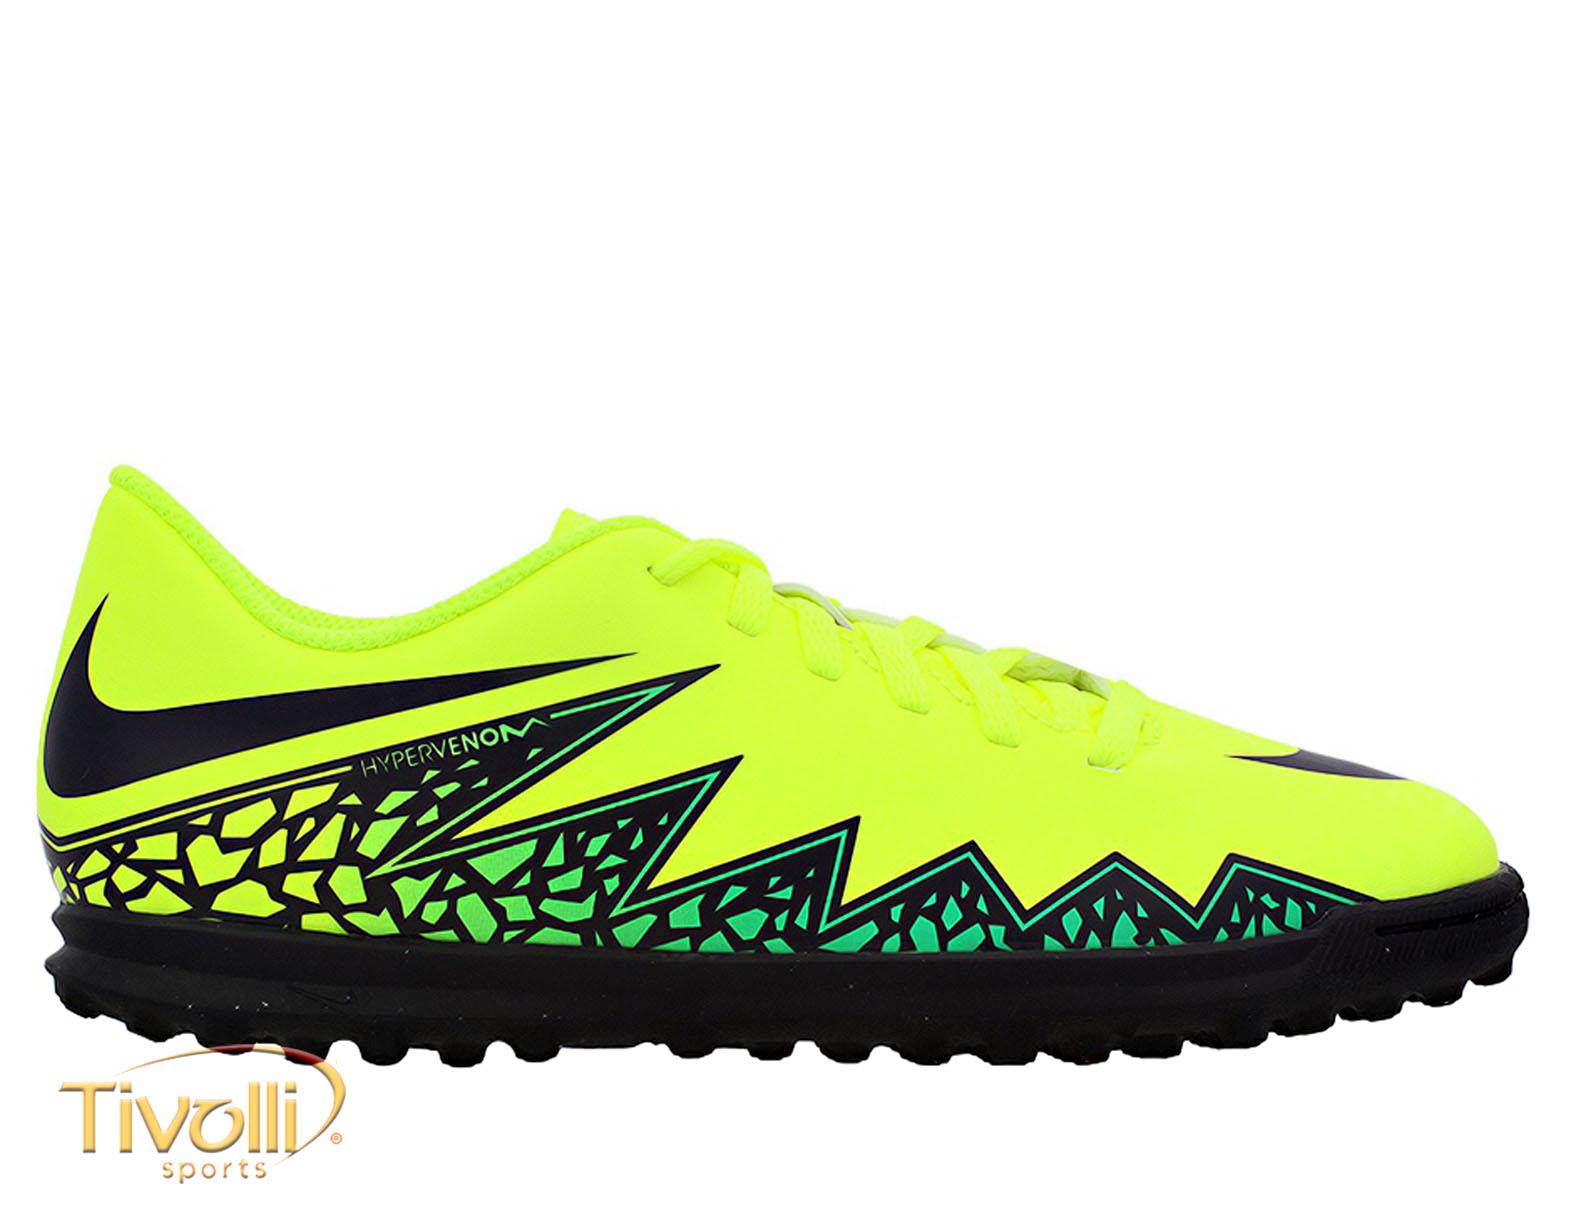 b2797ef42dfb3 Chuteira Nike Hypervenom Phade II Society Infantil > - Mega Saldão >